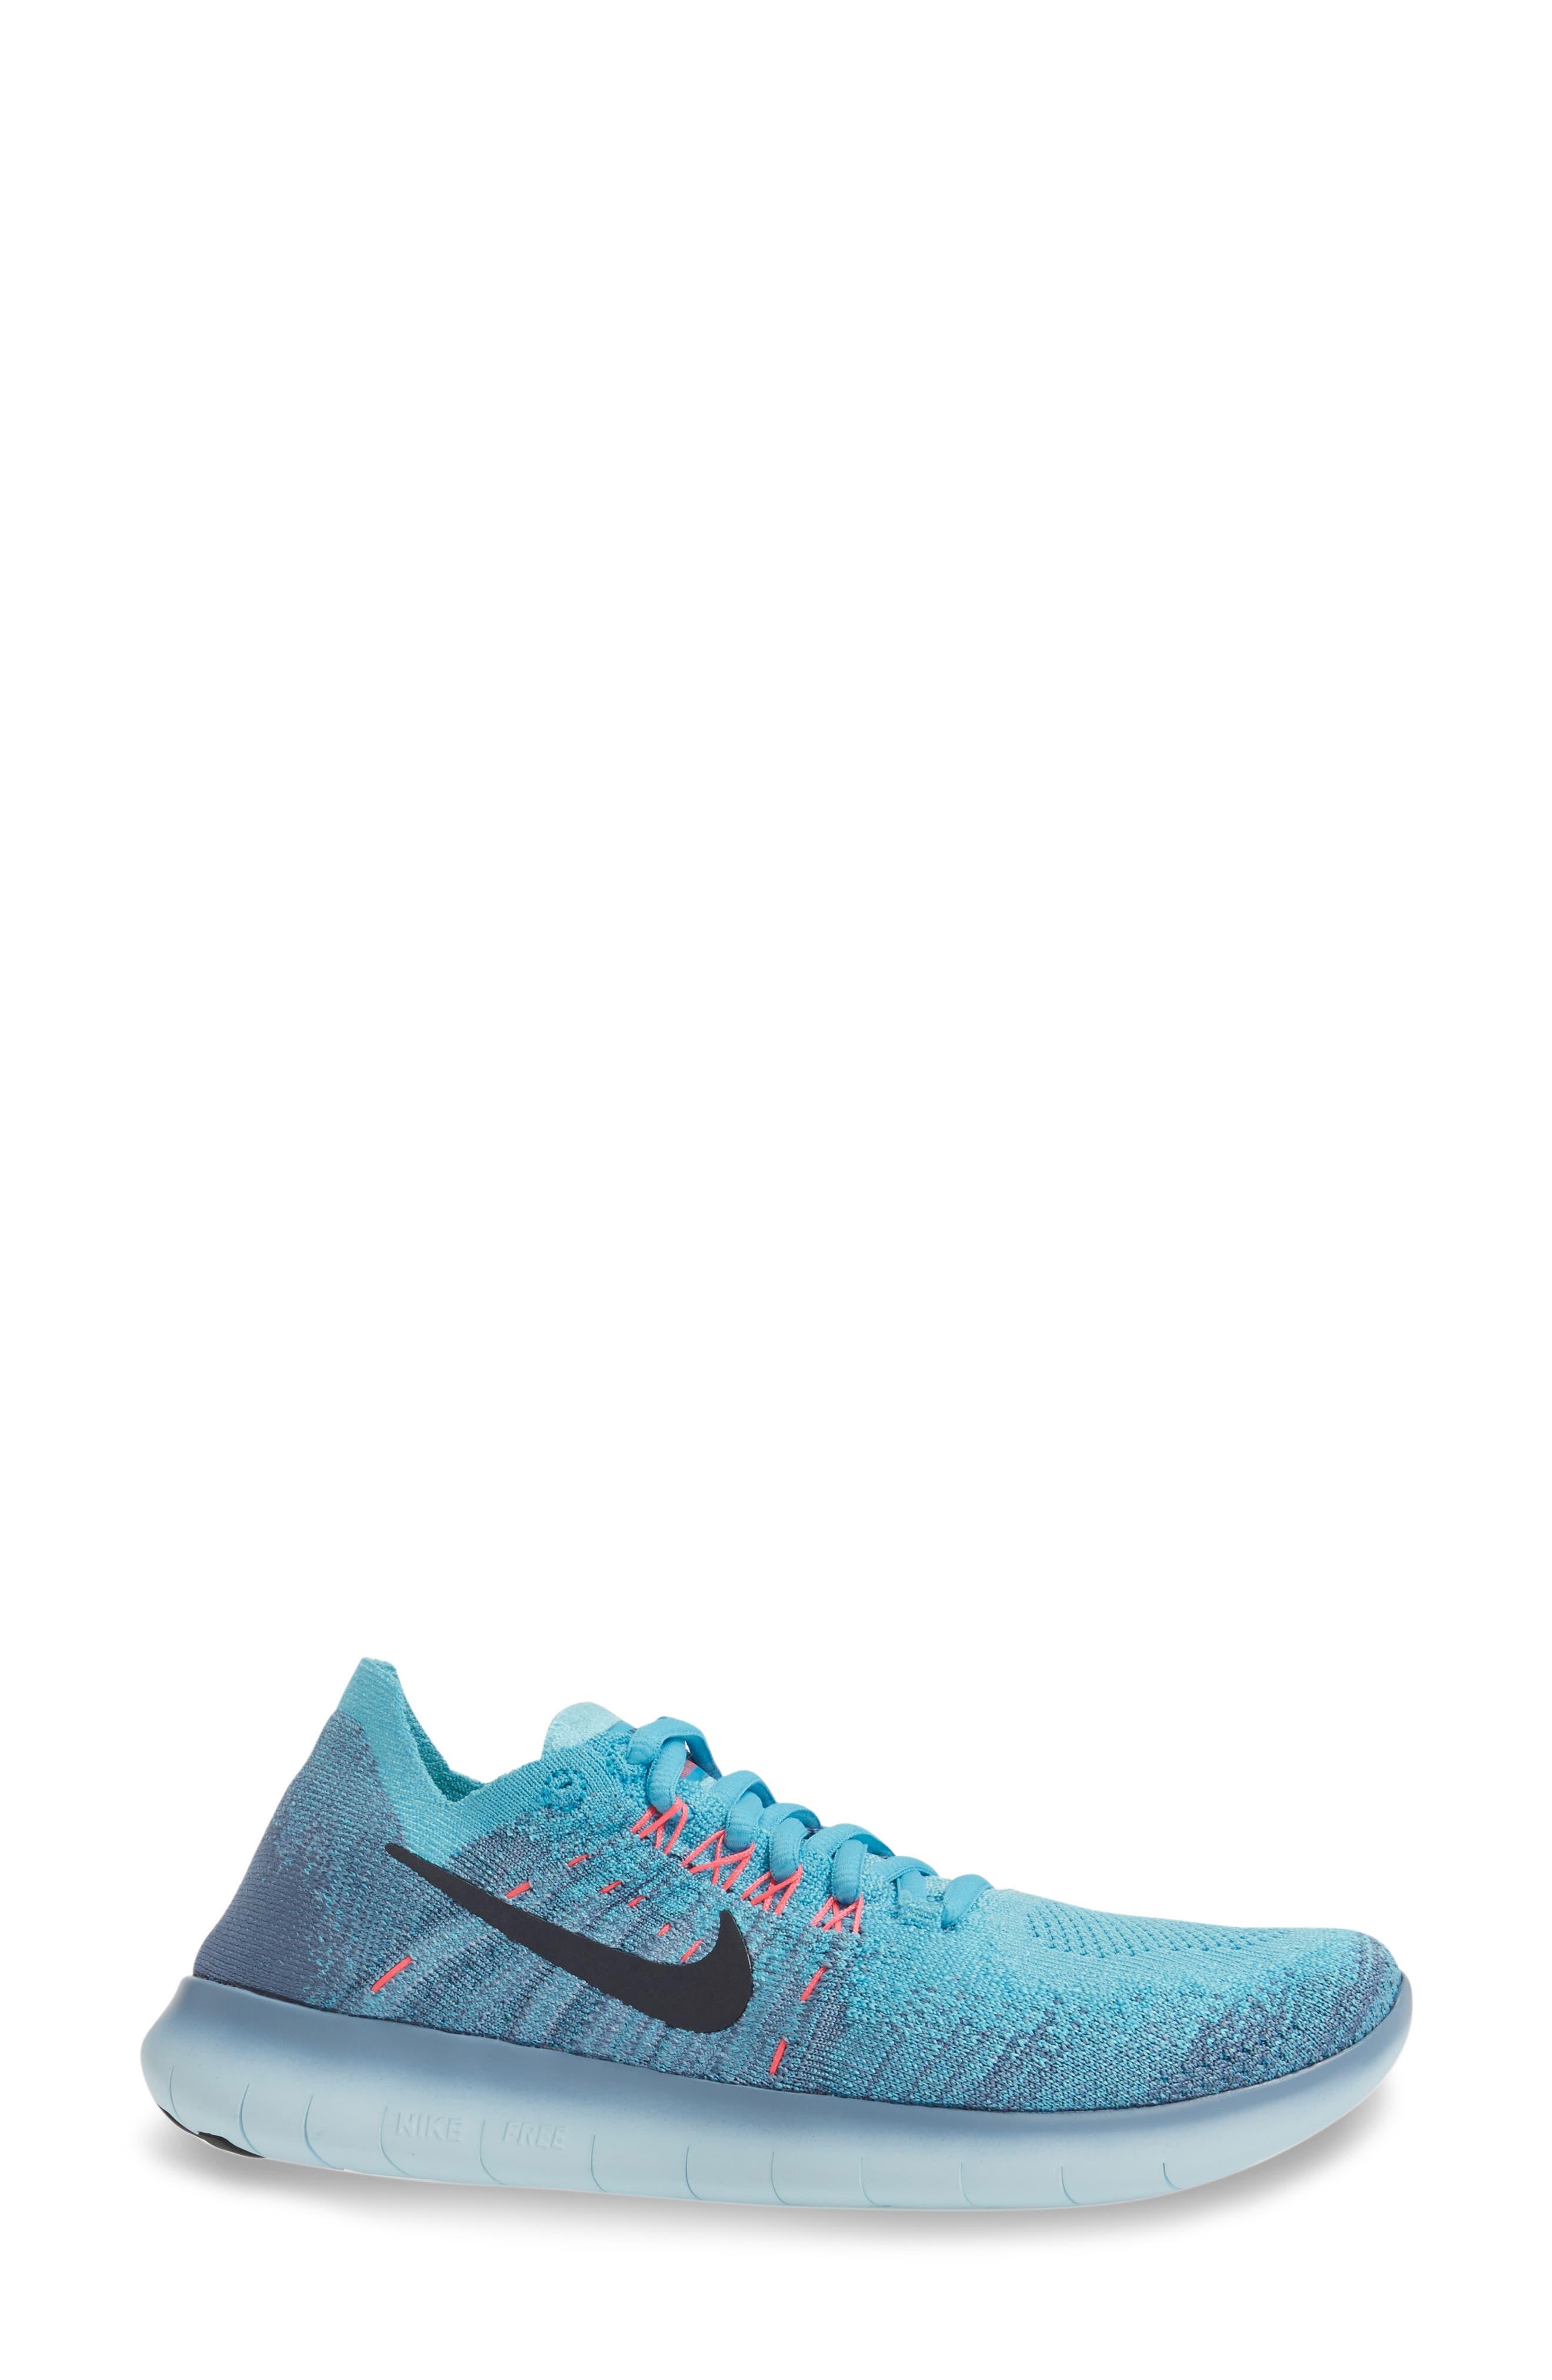 Alternate Image 3  - Nike Free RN Flyknit 2 Running Shoe (Women)